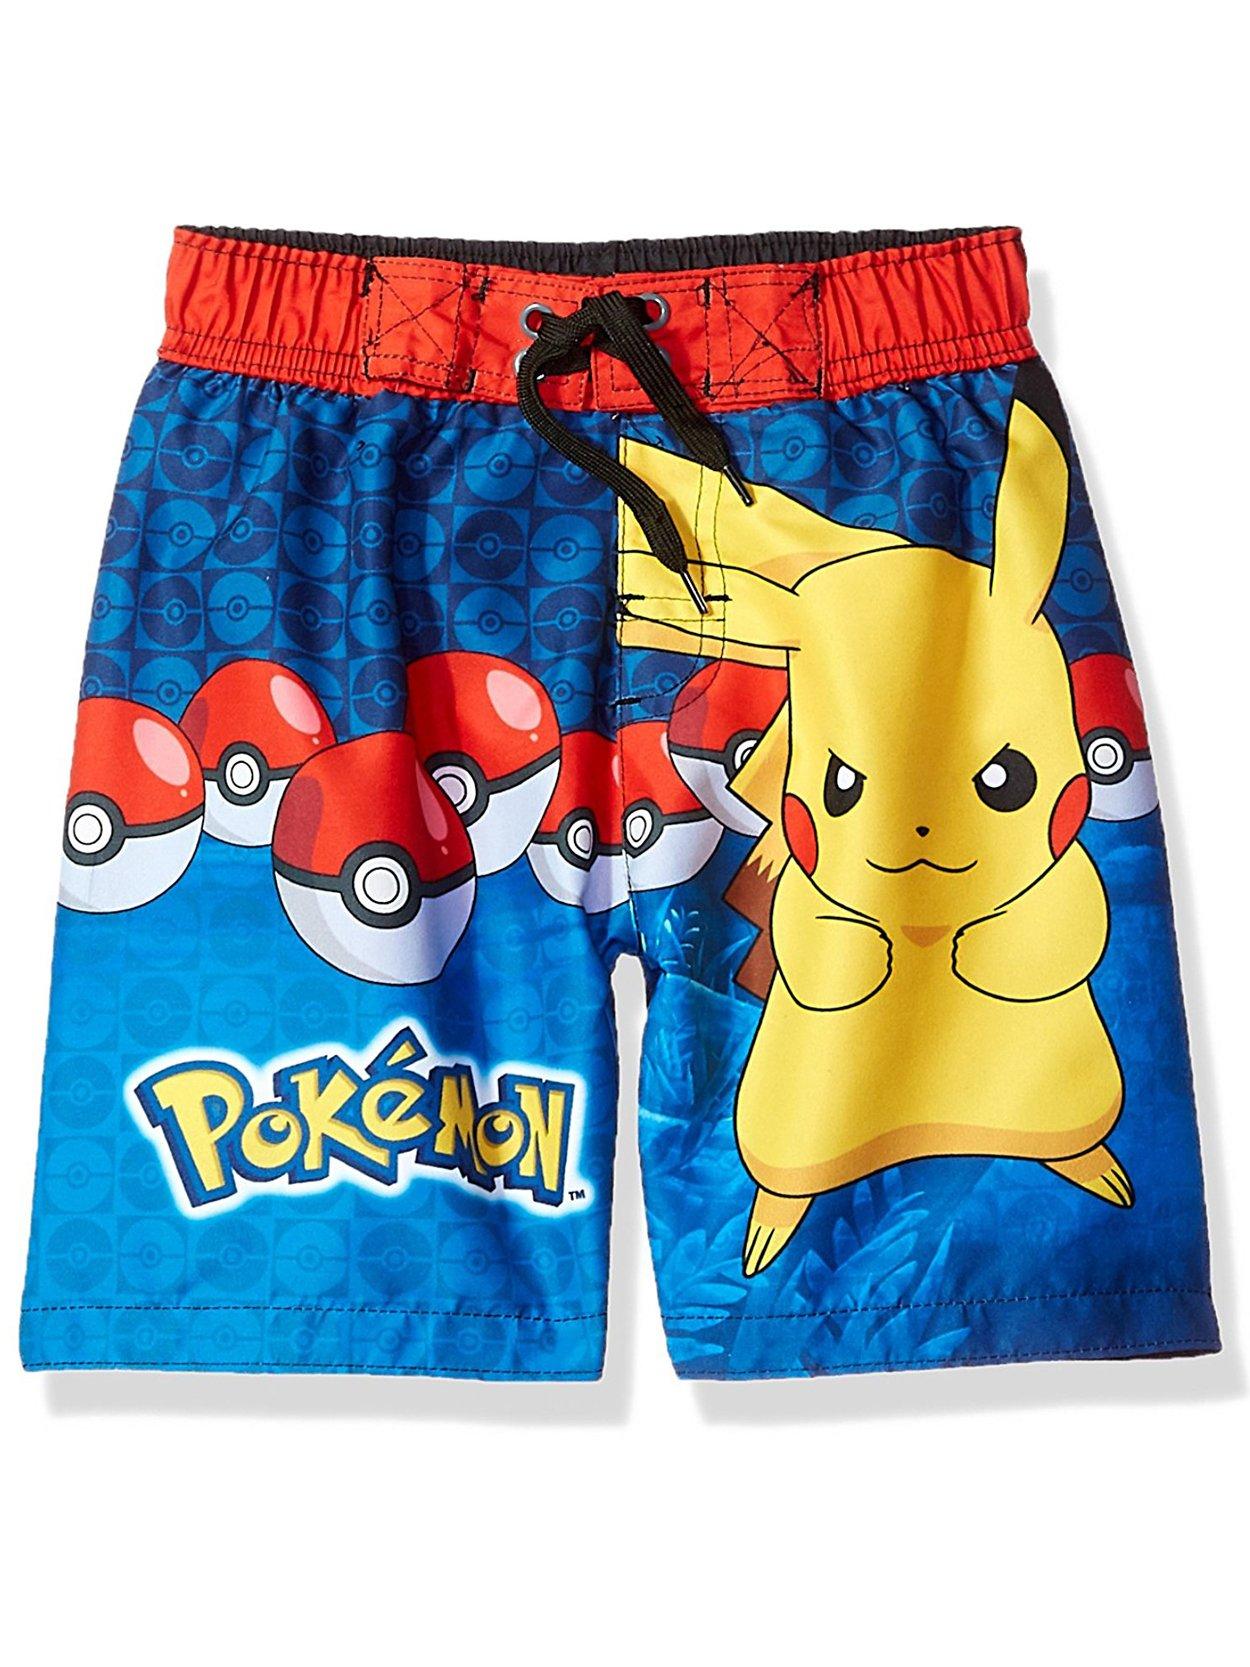 Pokemon Pikachu Boys Swim Trunks Swimwear (Little Kid/Big Kid) (5-6, Navy Blue)